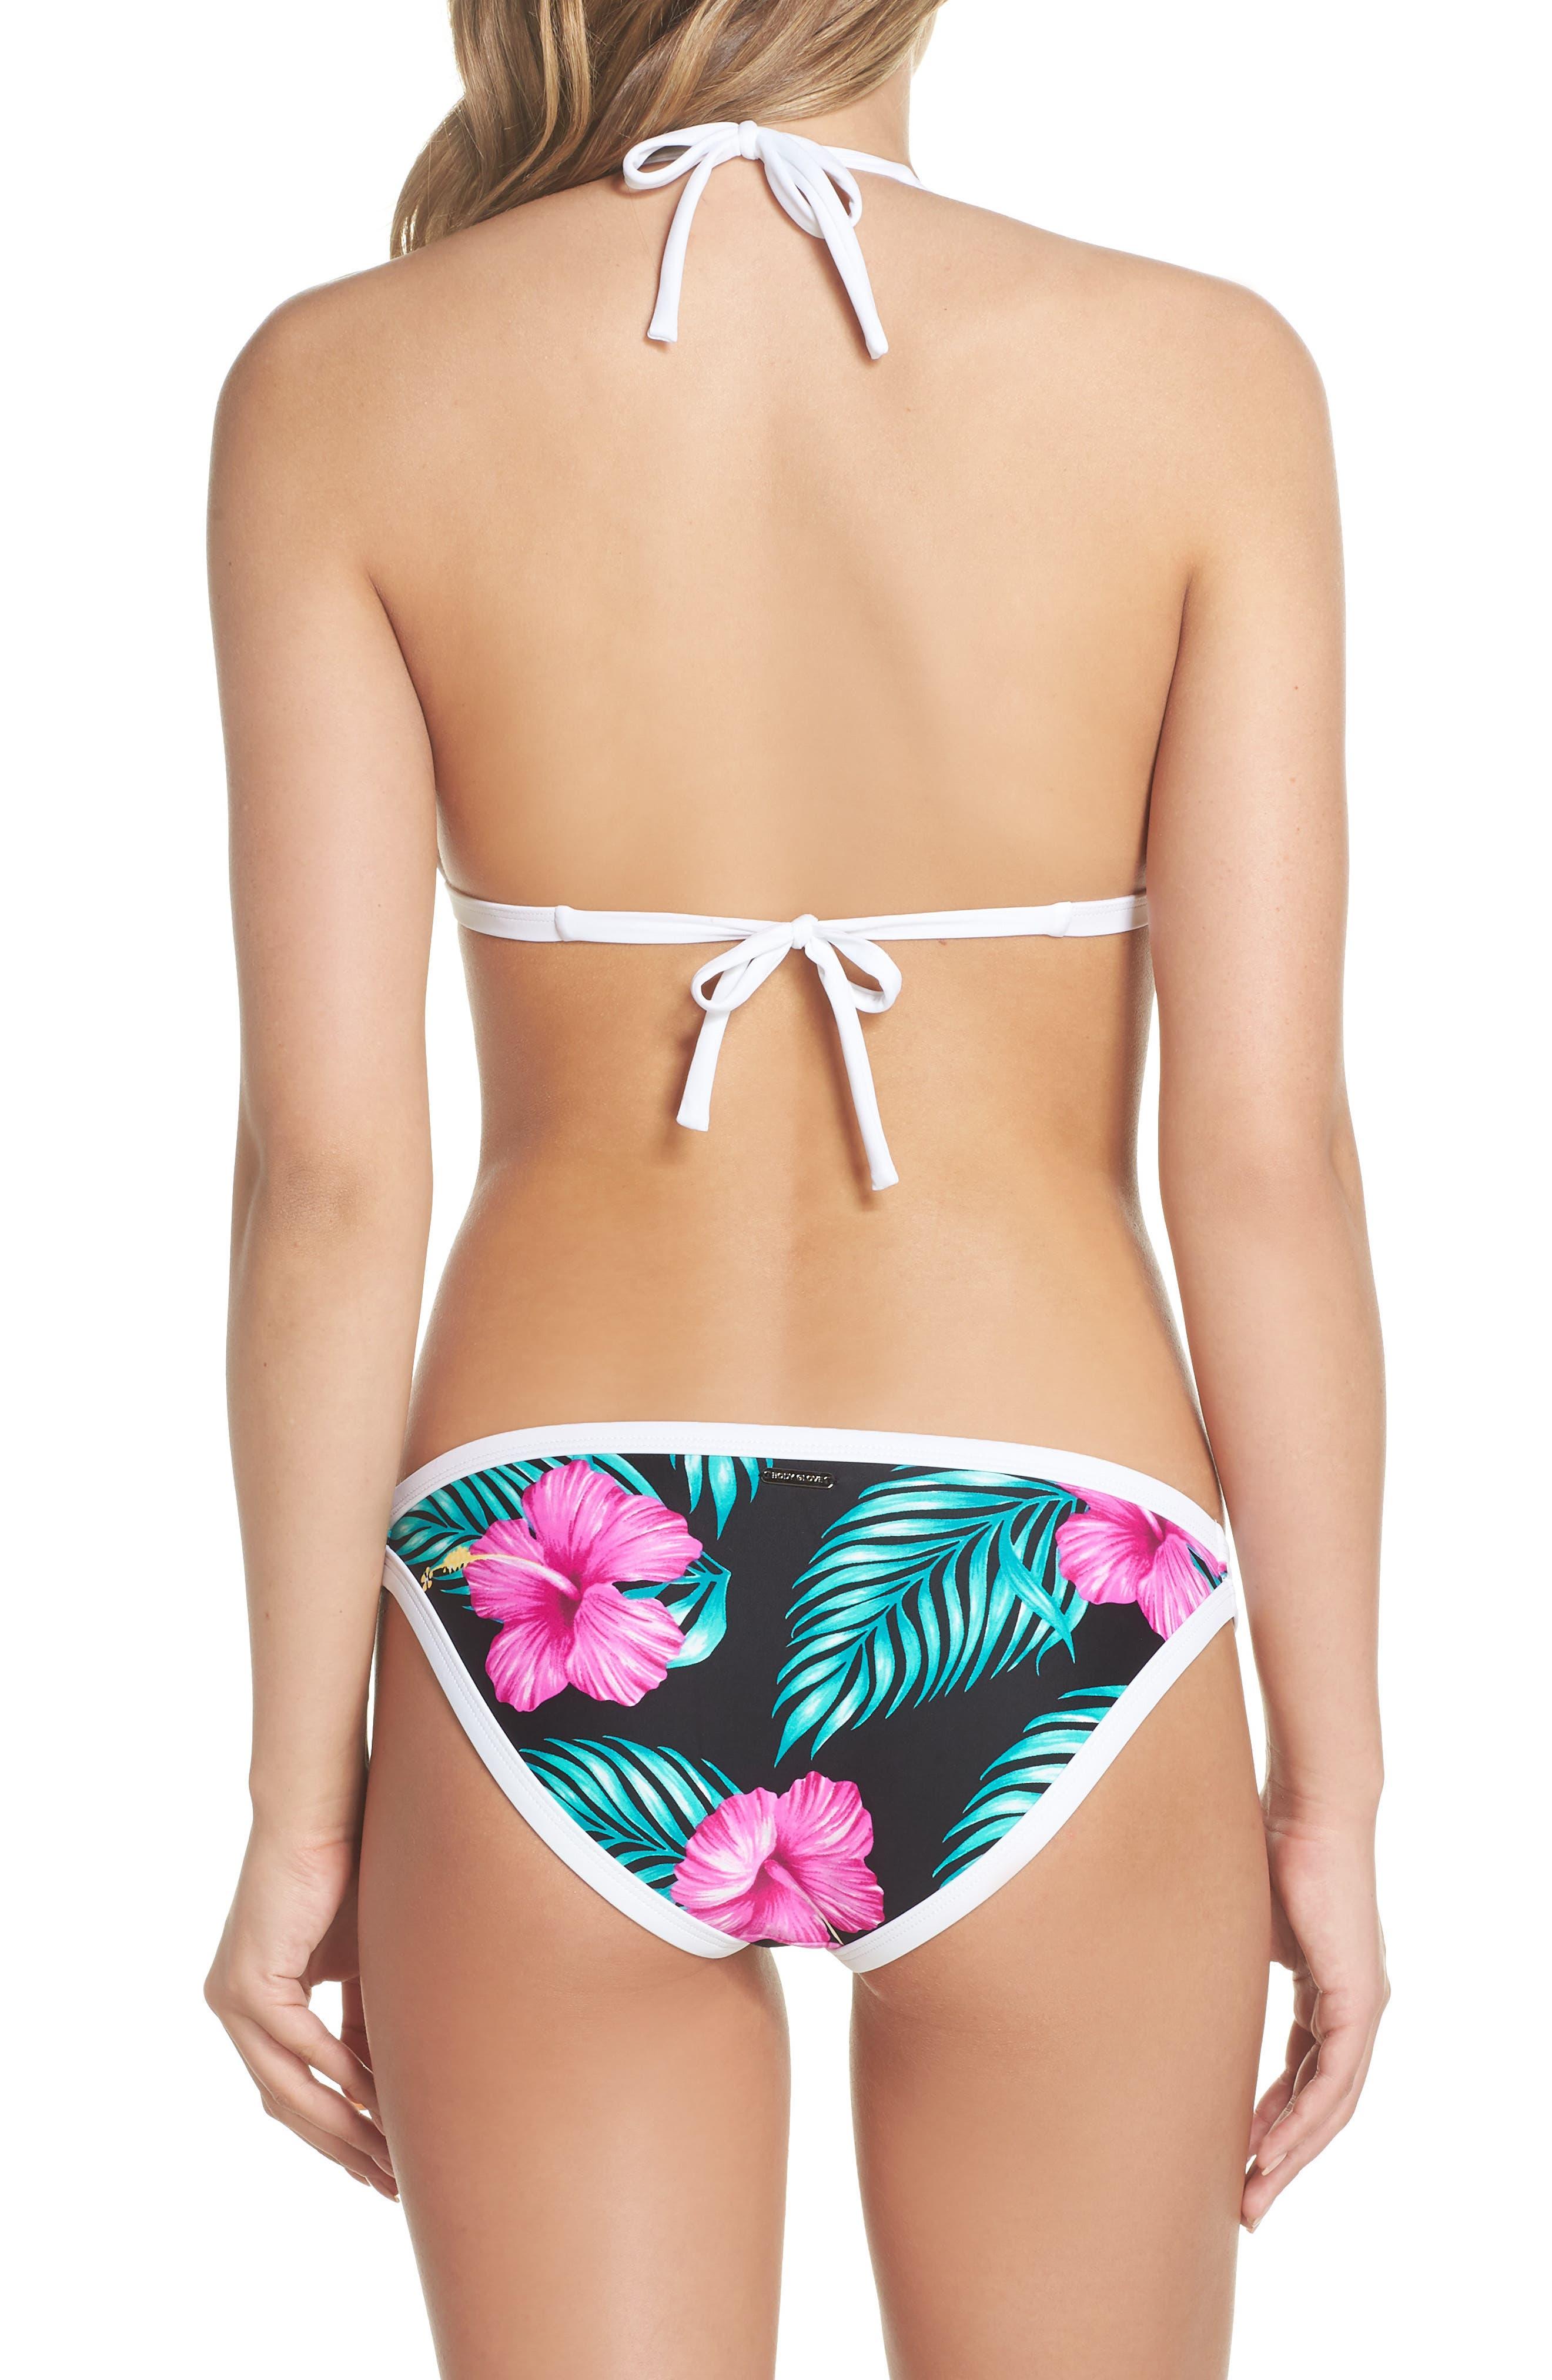 Molokai Love Bikini Top,                             Alternate thumbnail 6, color,                             Black